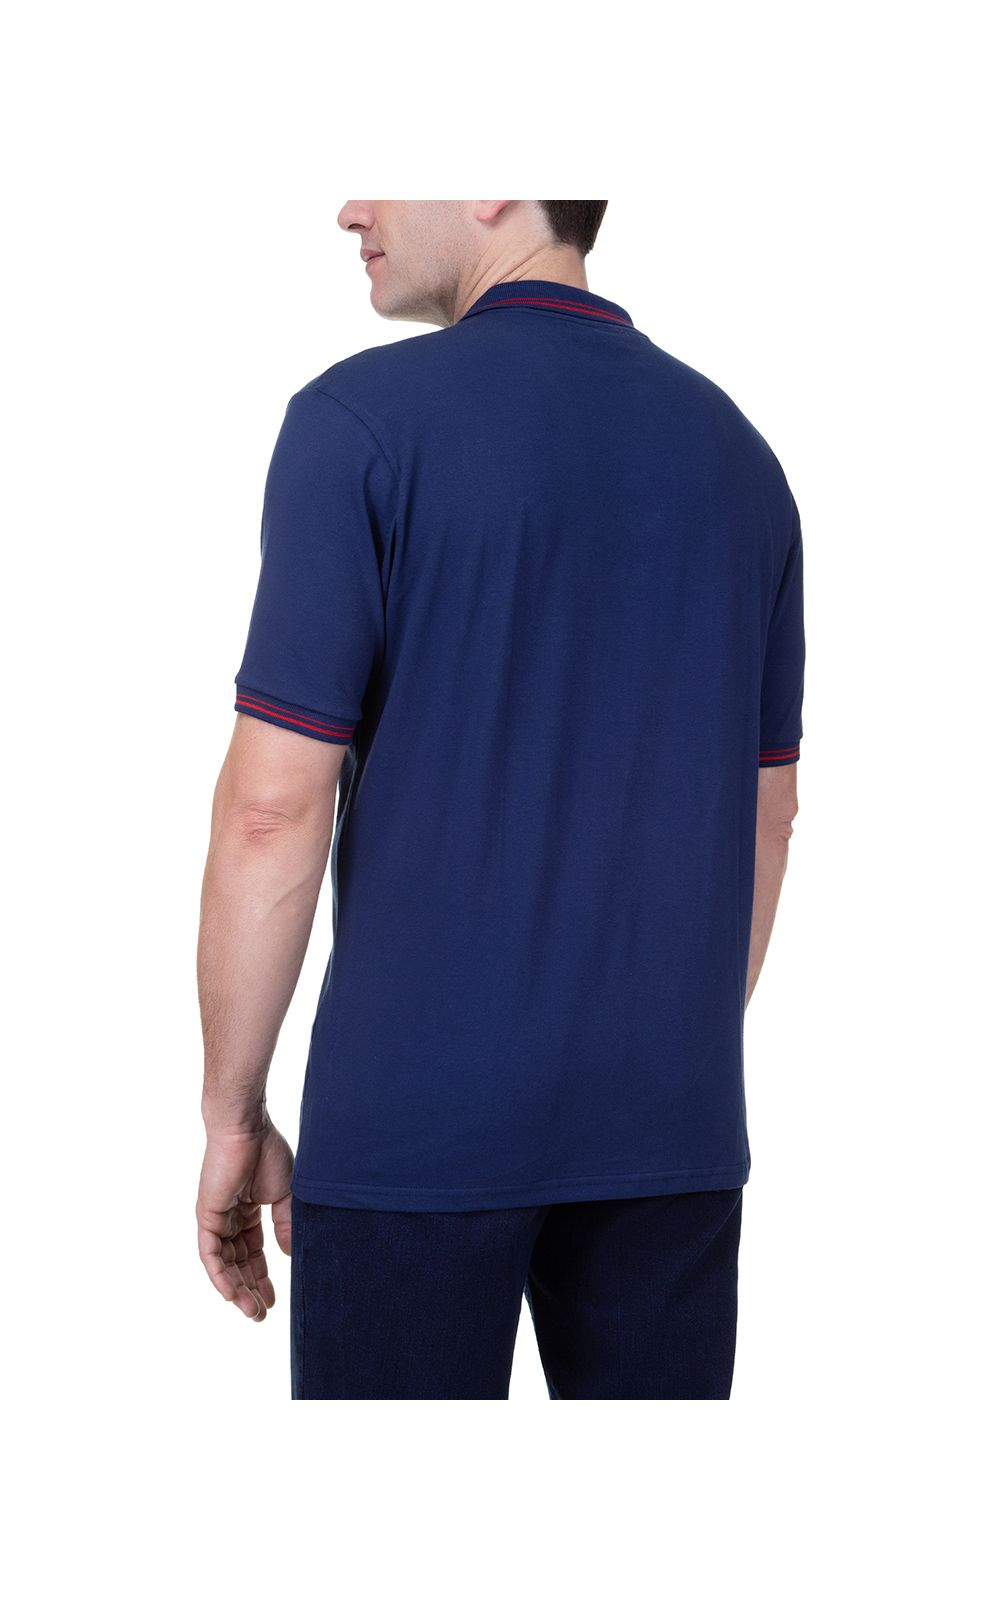 Foto 2 - Camisa Polo Masculina Azul Marinho Detalhada